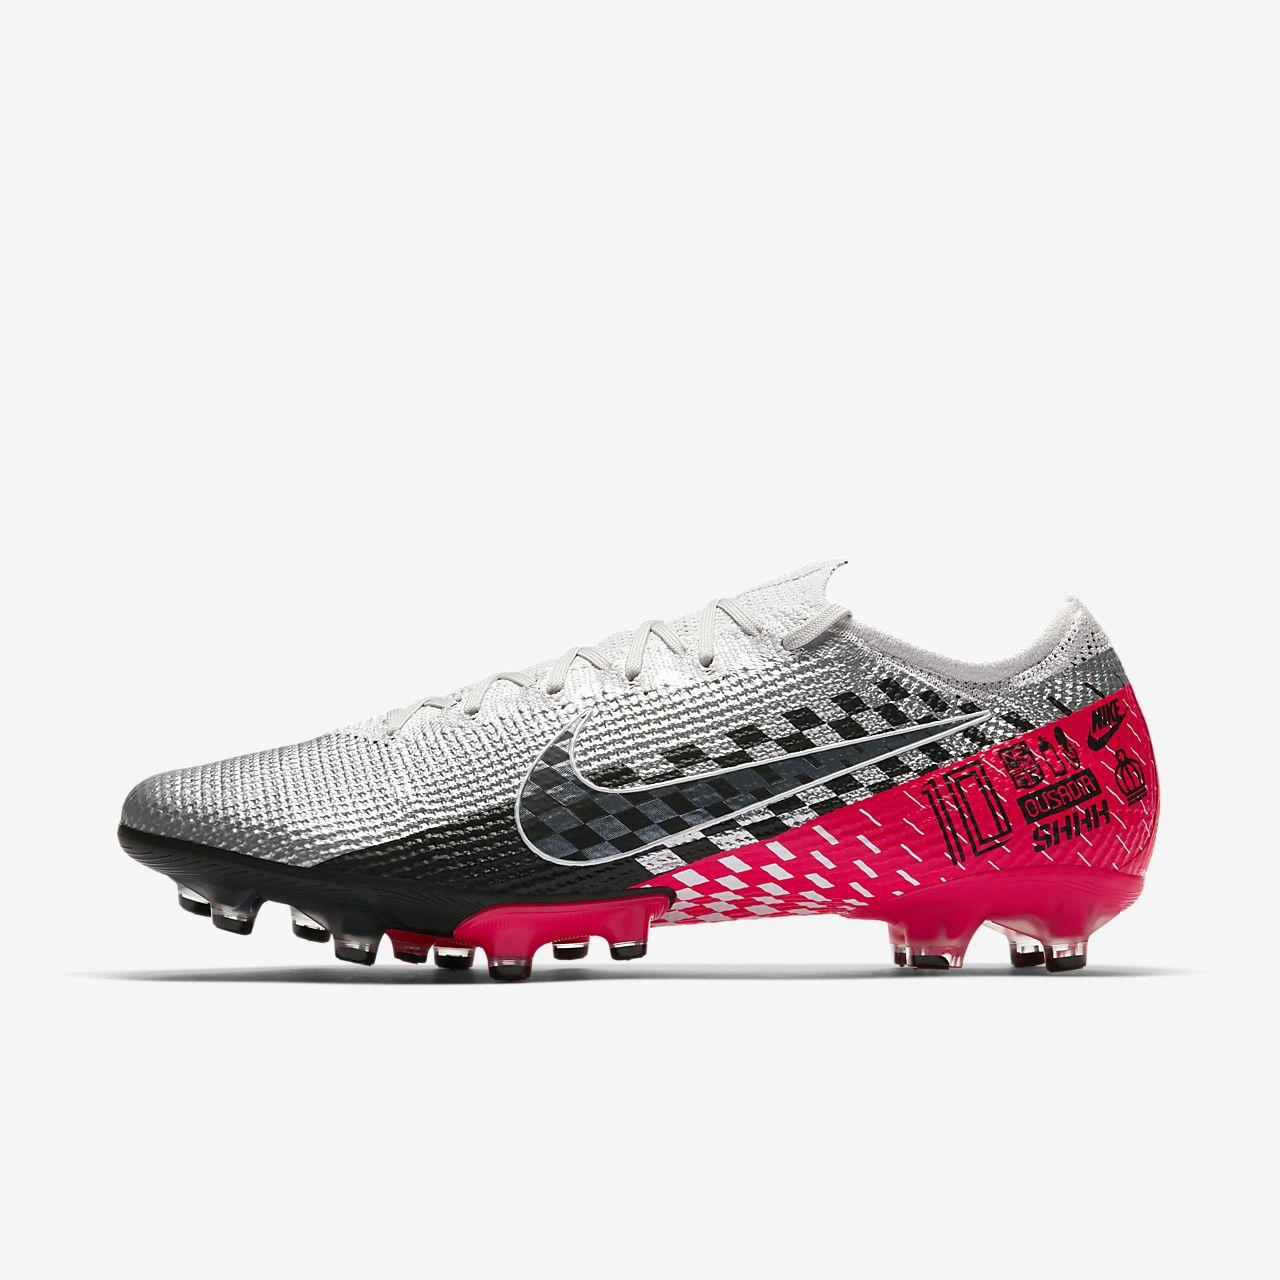 Nike Mercurial Vapor 13 Elite Neymar Jr. AG-PRO Voetbalschoen (kunstgras)